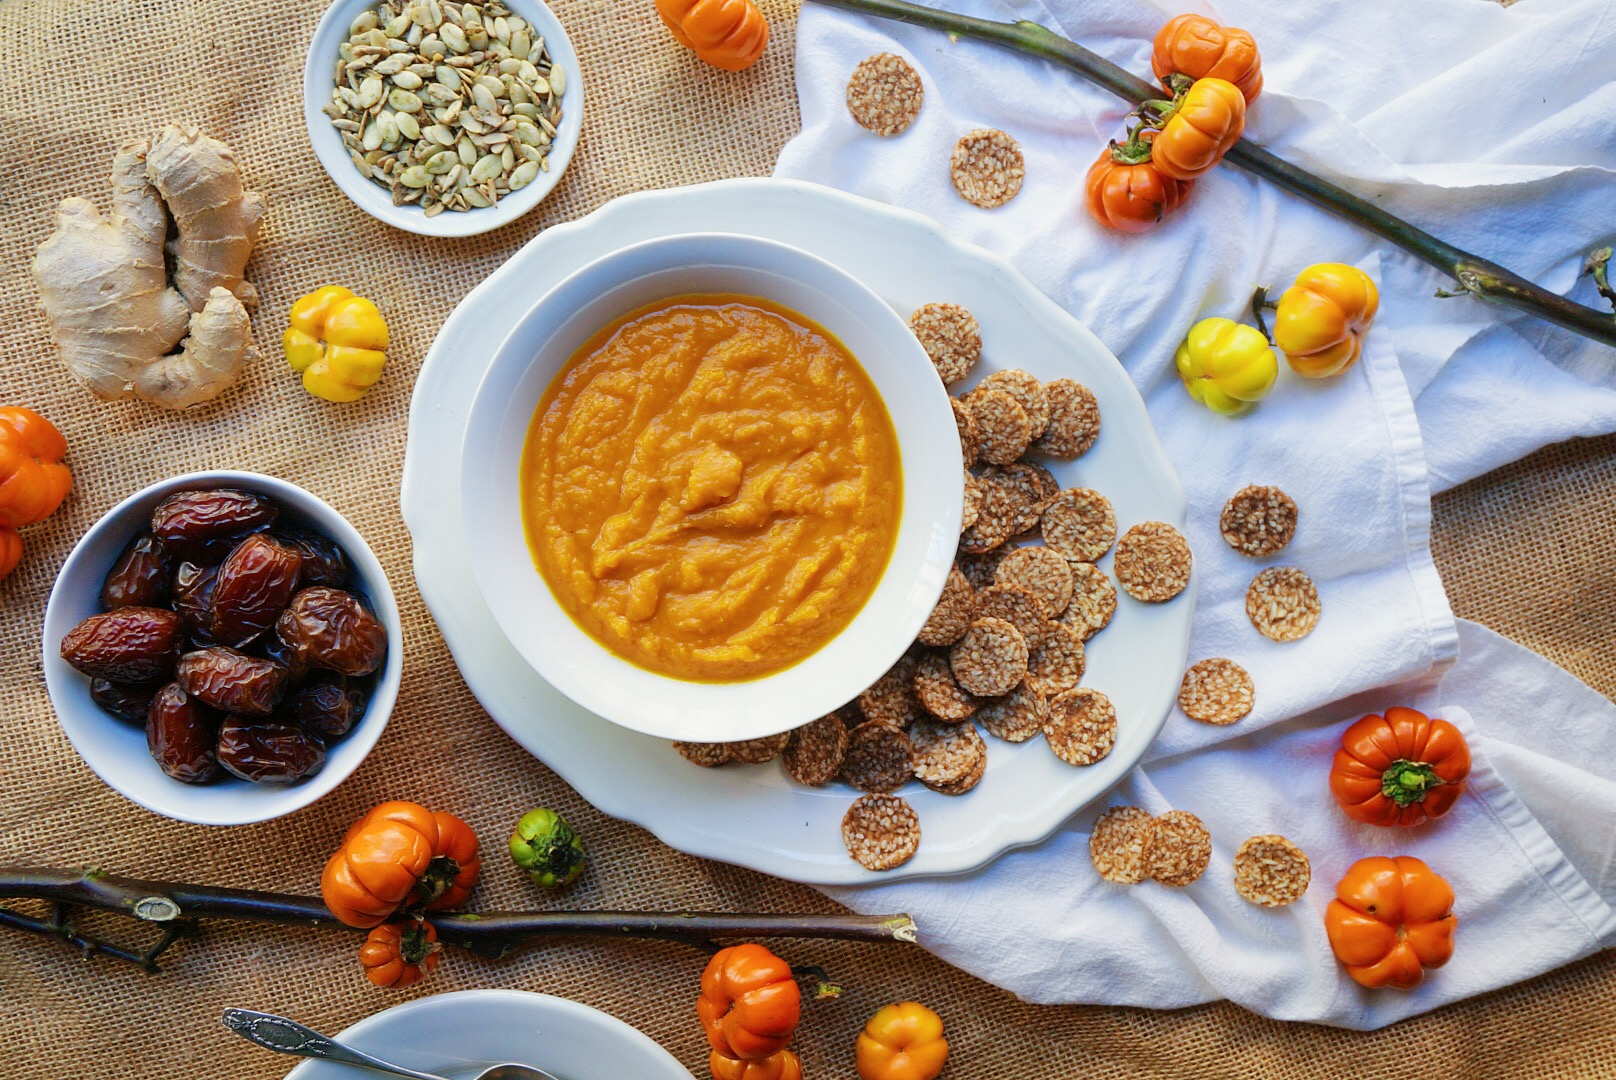 Mini Pumpkin Pie ingredients